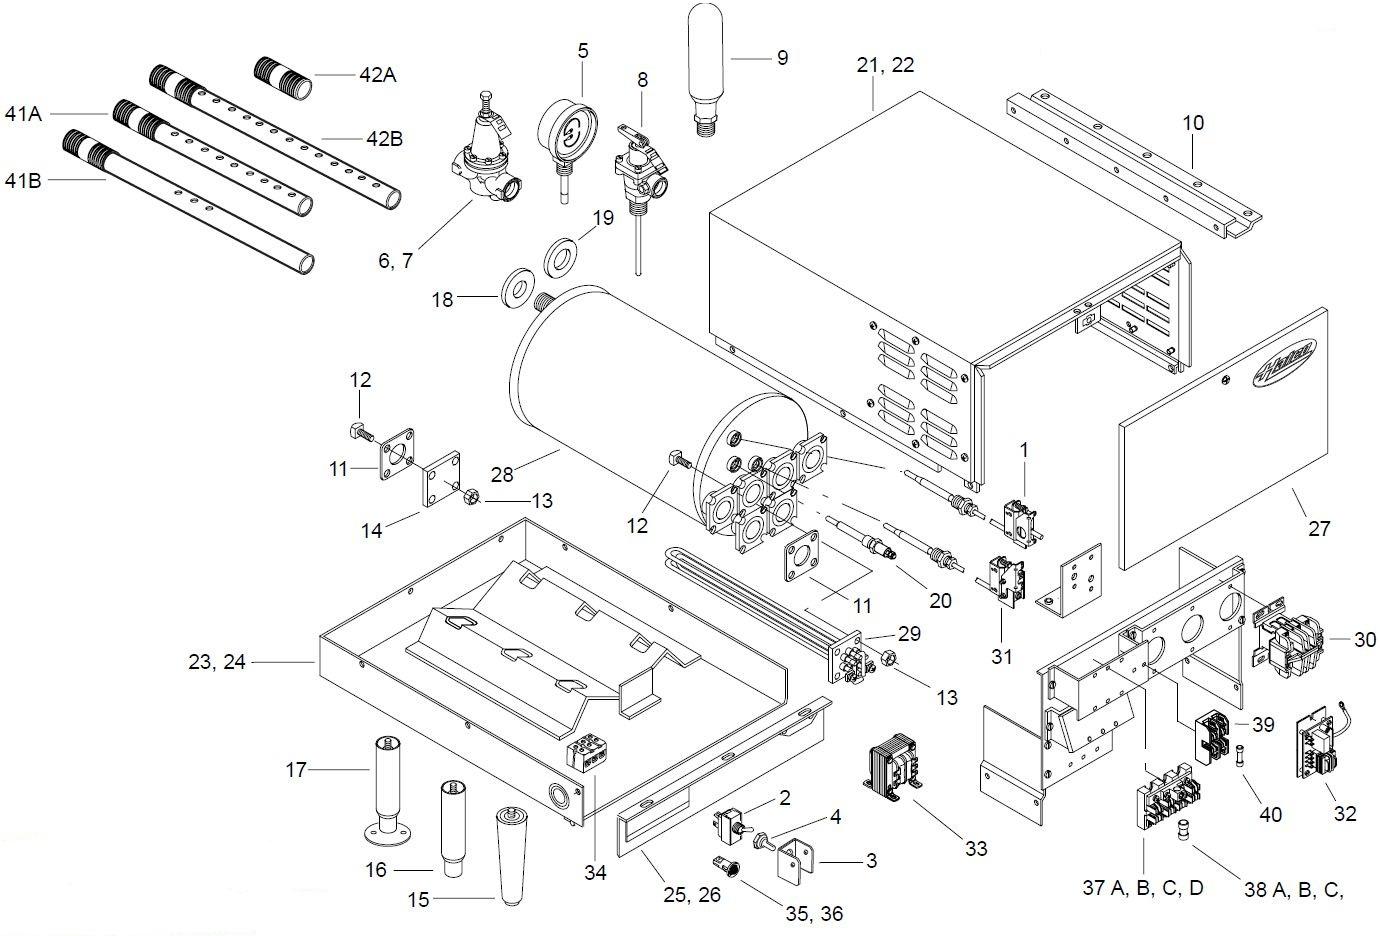 hight resolution of c 12 parts list